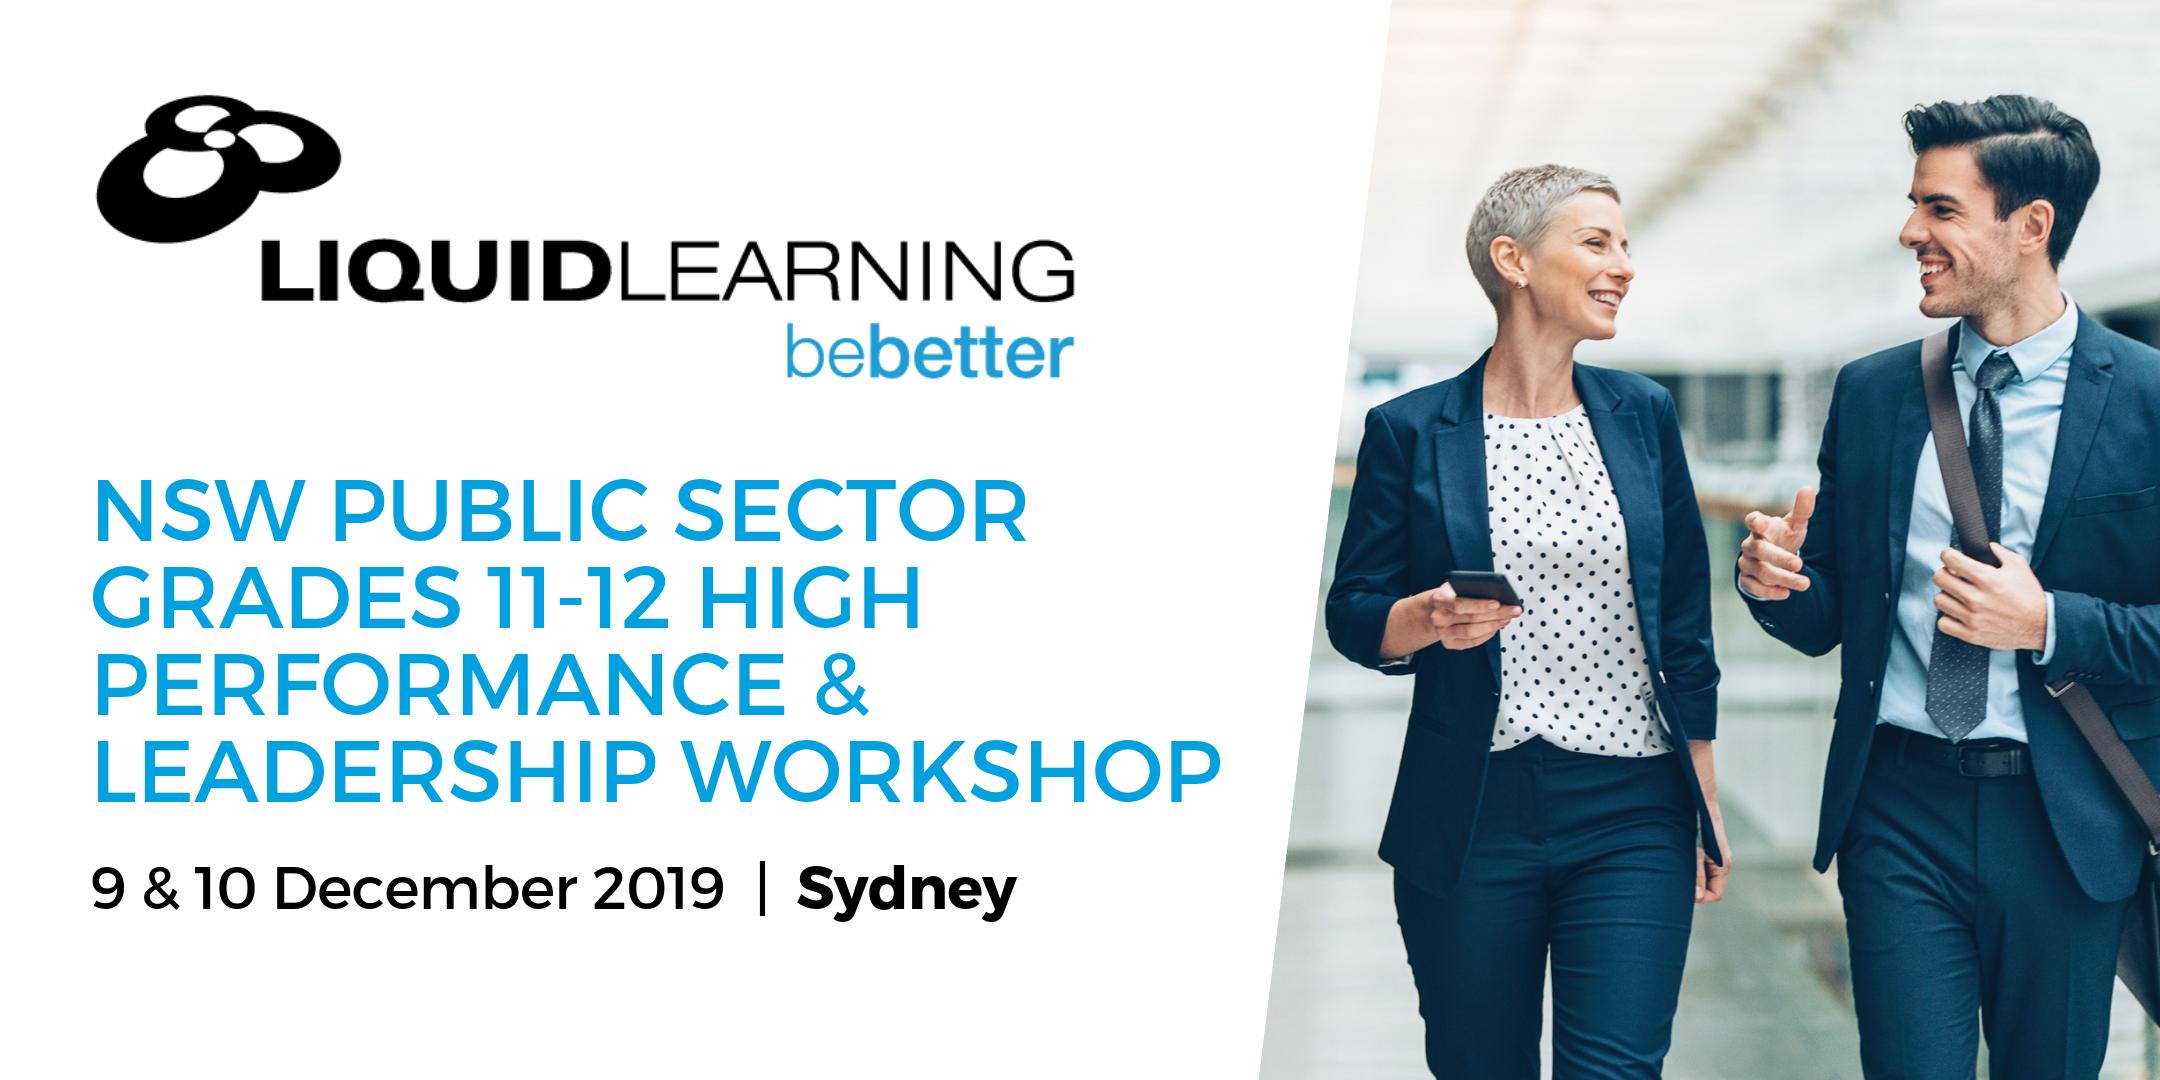 NSW Public Sector Grades 11-12 High Performance & Leadership Workshop